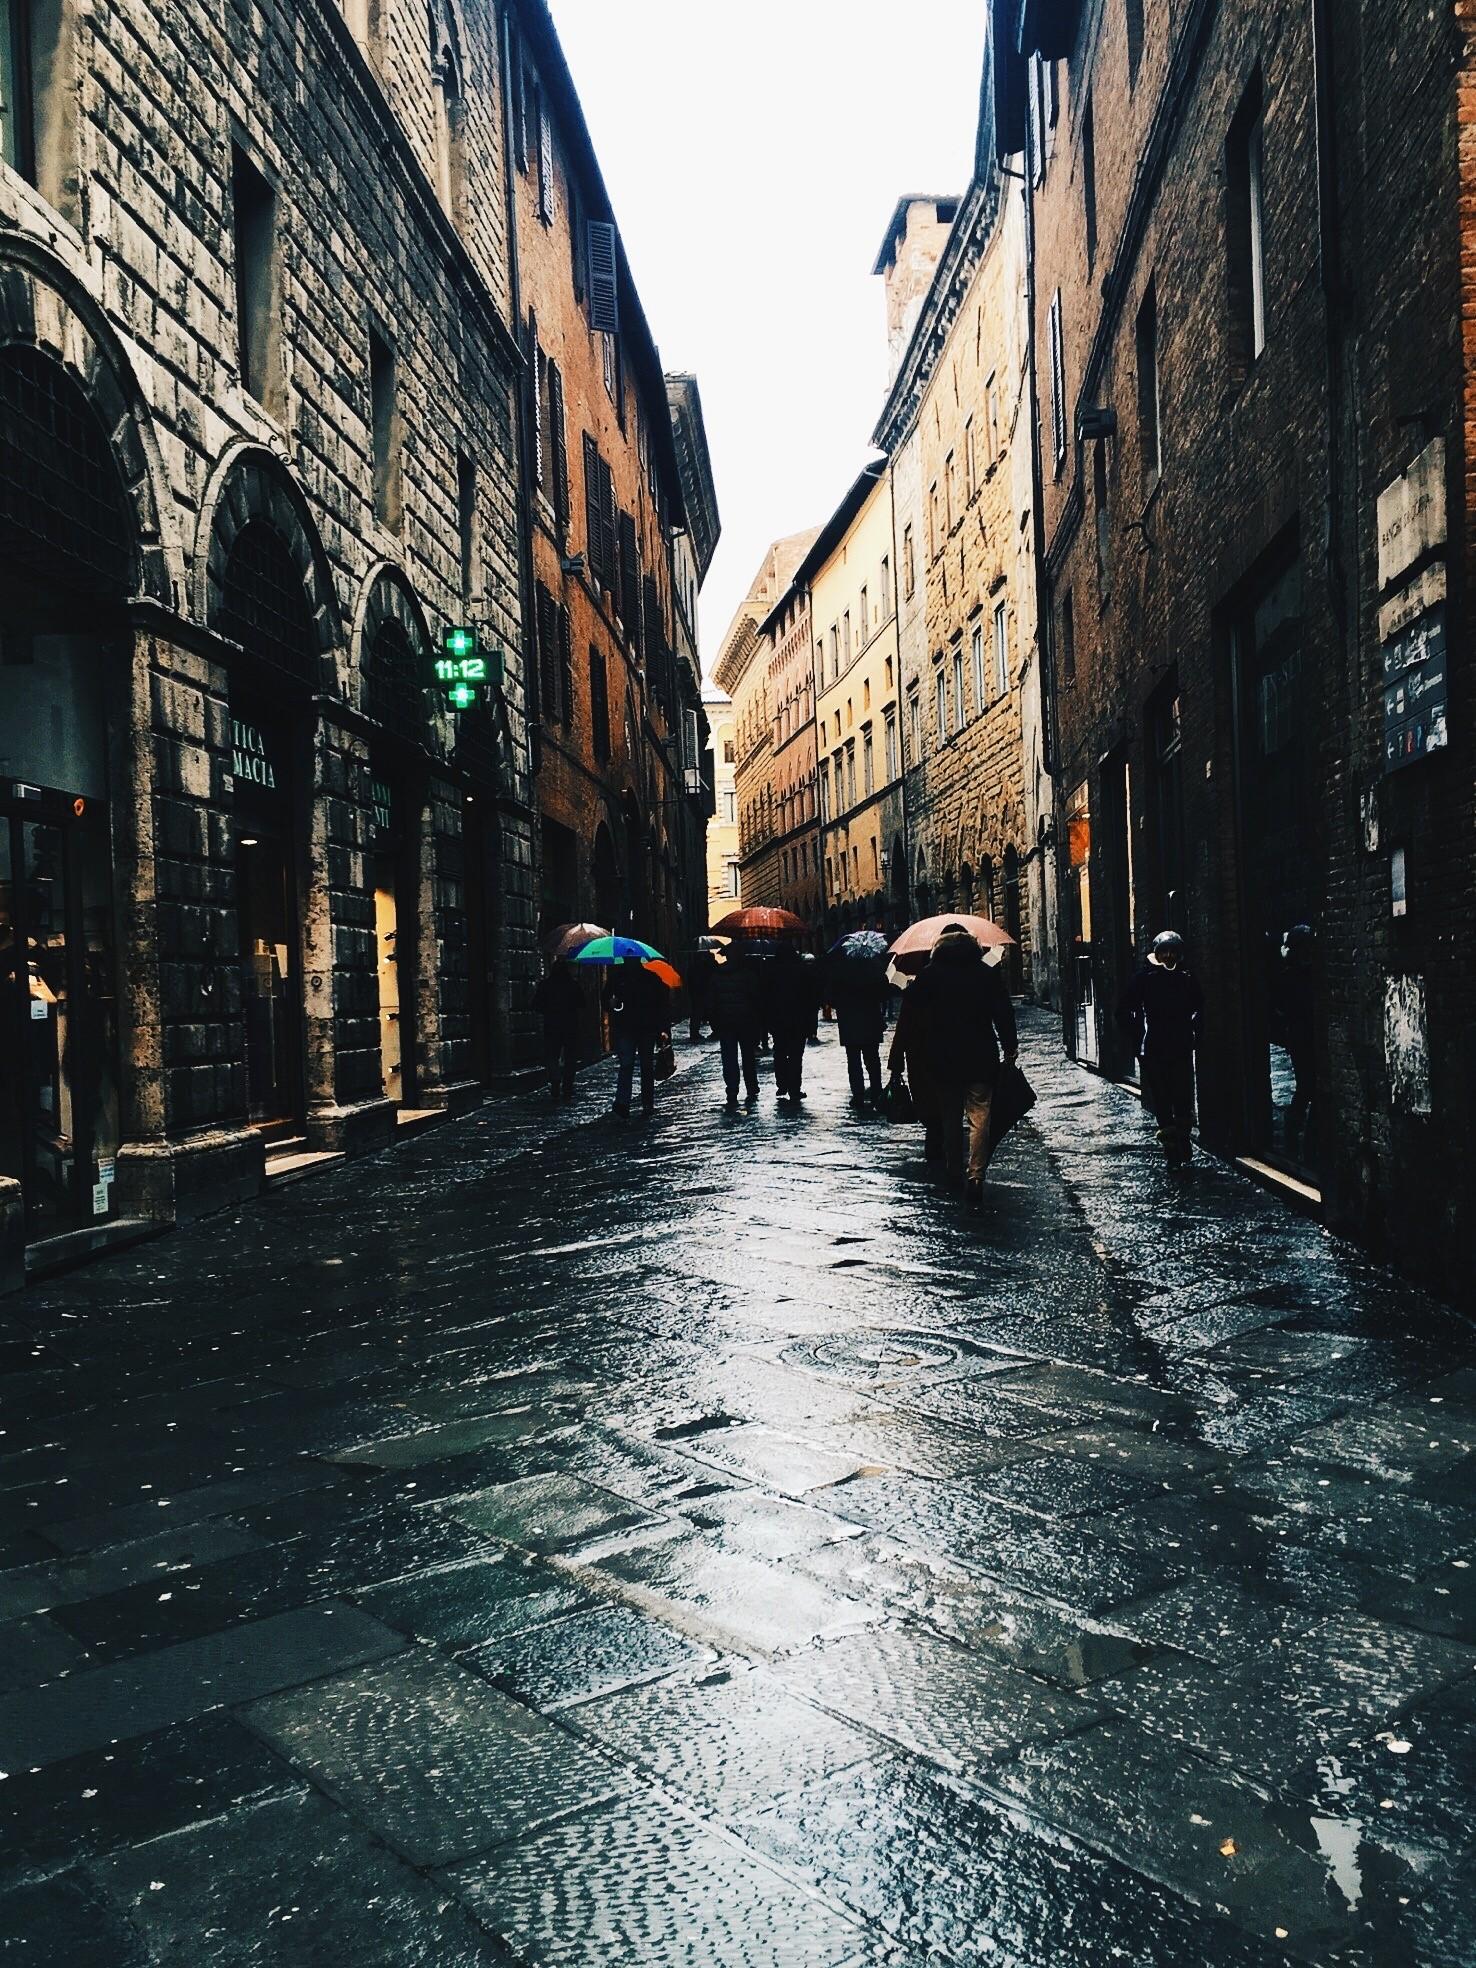 CAPAStudyAbroad_Florence_From Emily Kearns - Day Trips - Siena, San Gimignano2.jpg